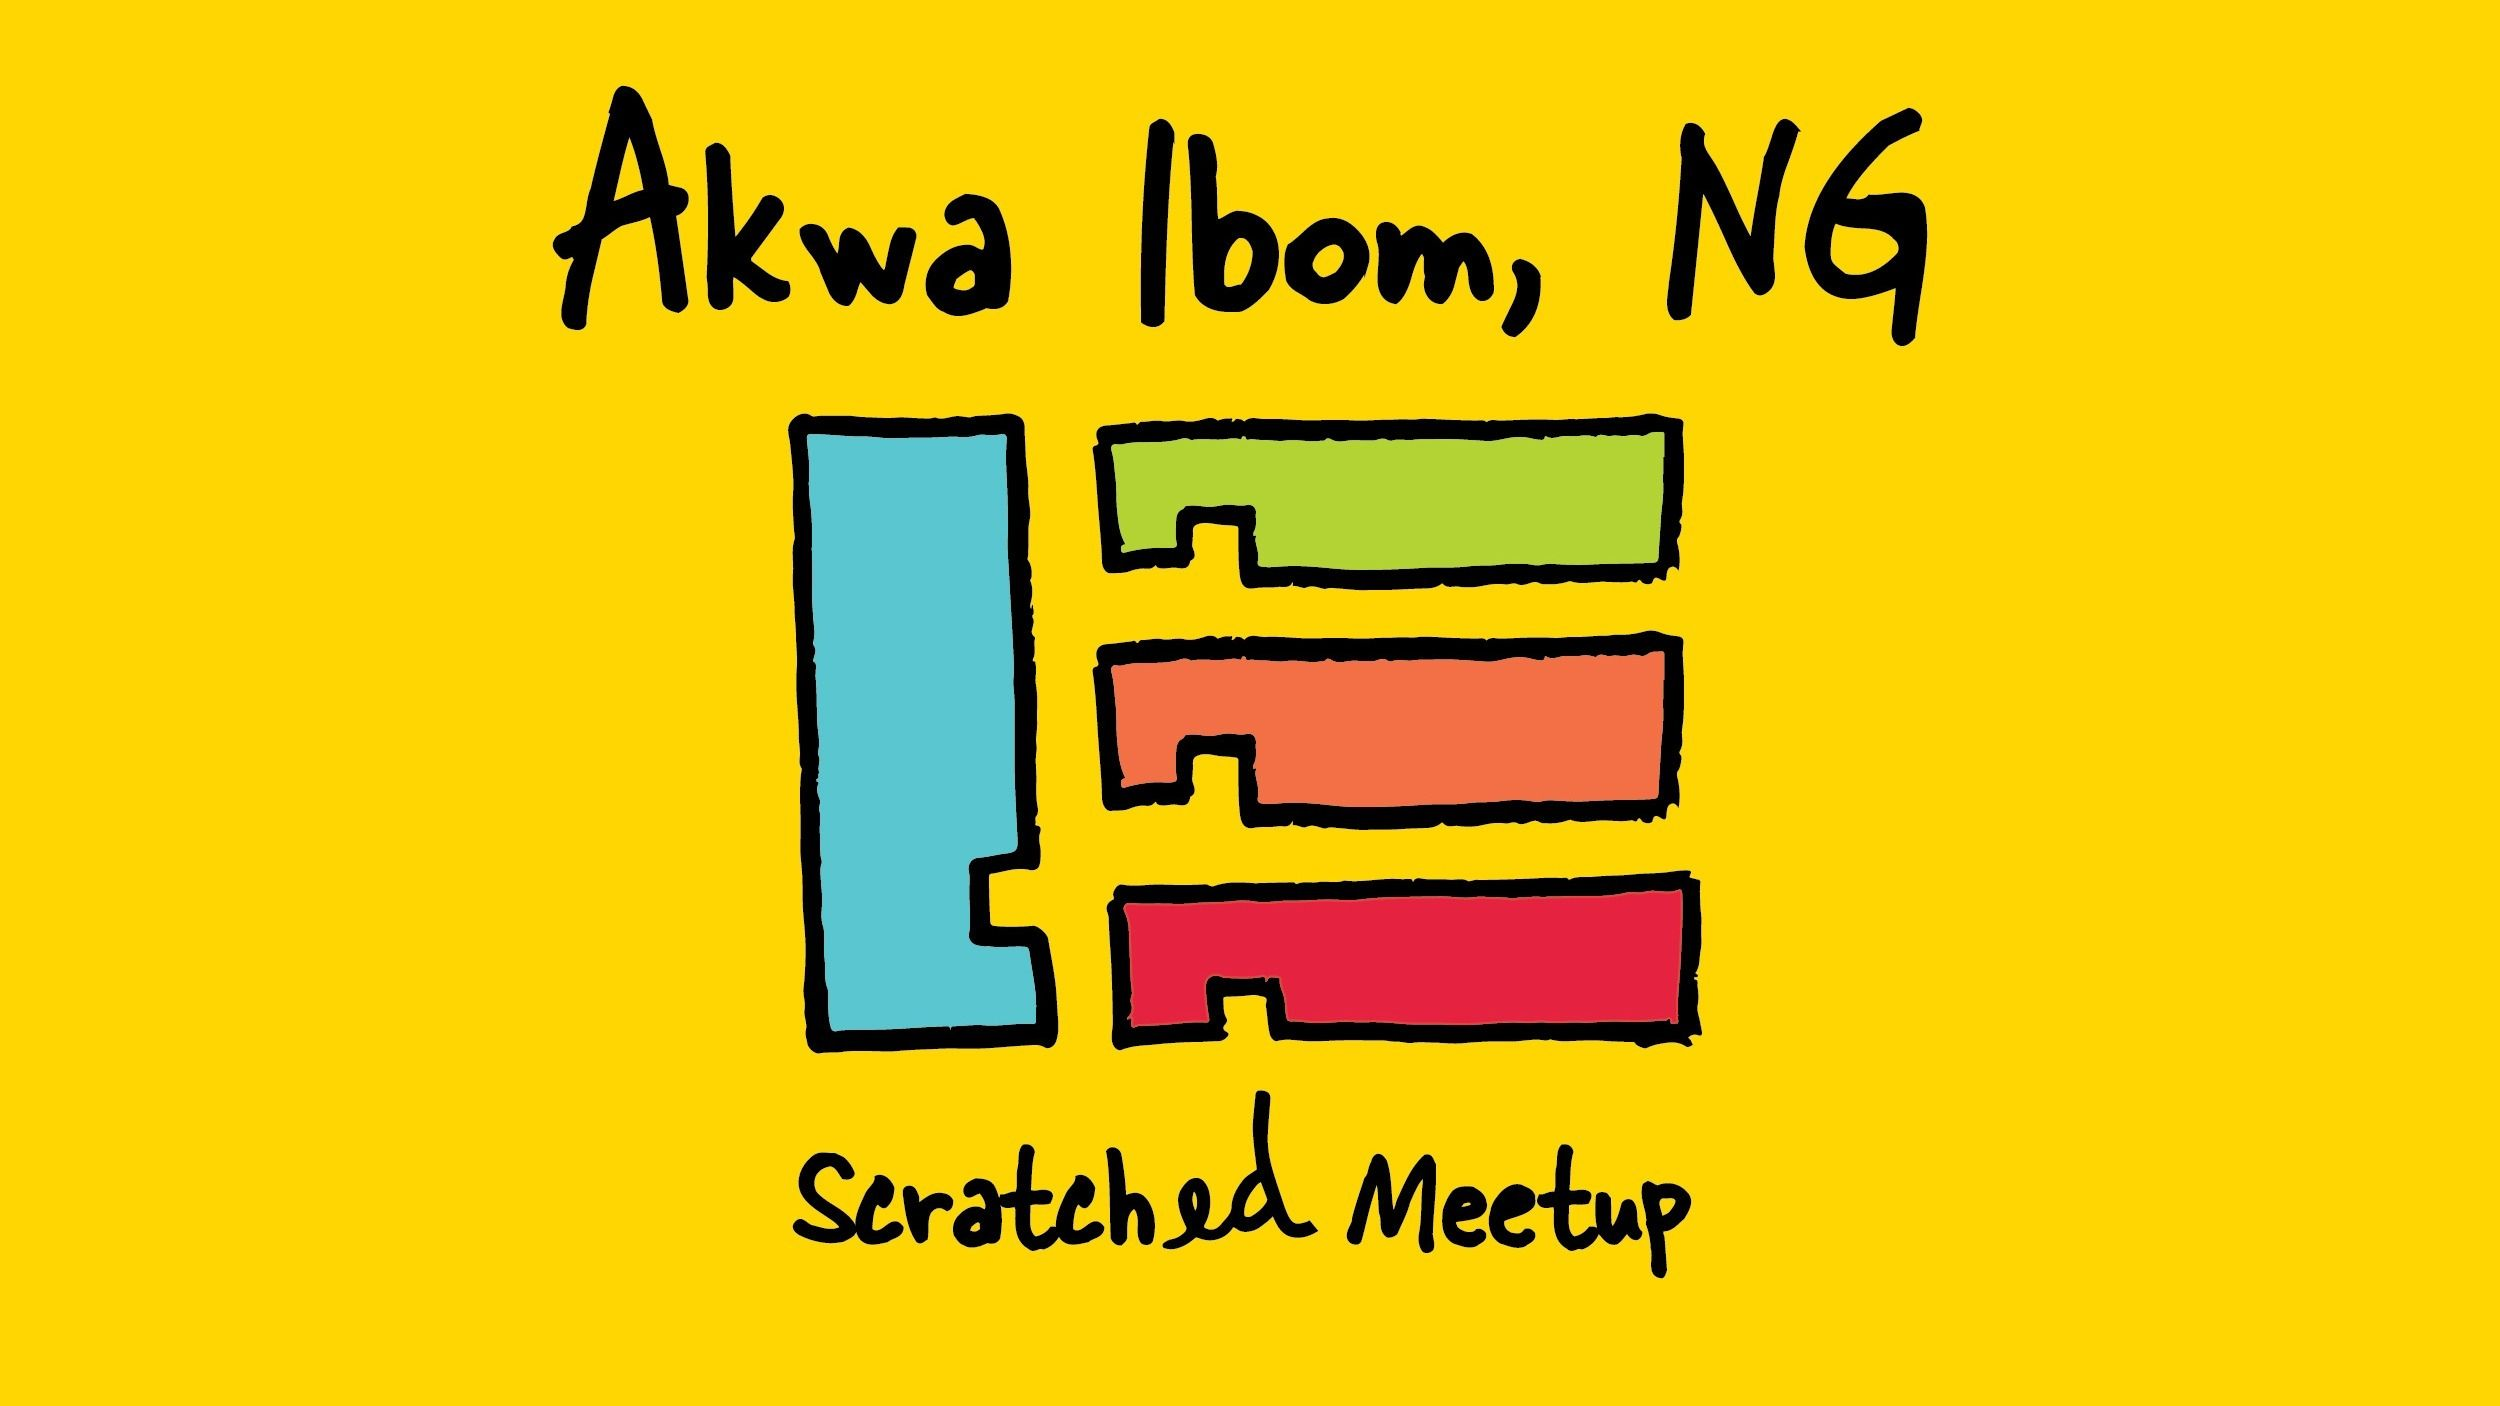 Akwa Ibom Scratch Educator Meetup